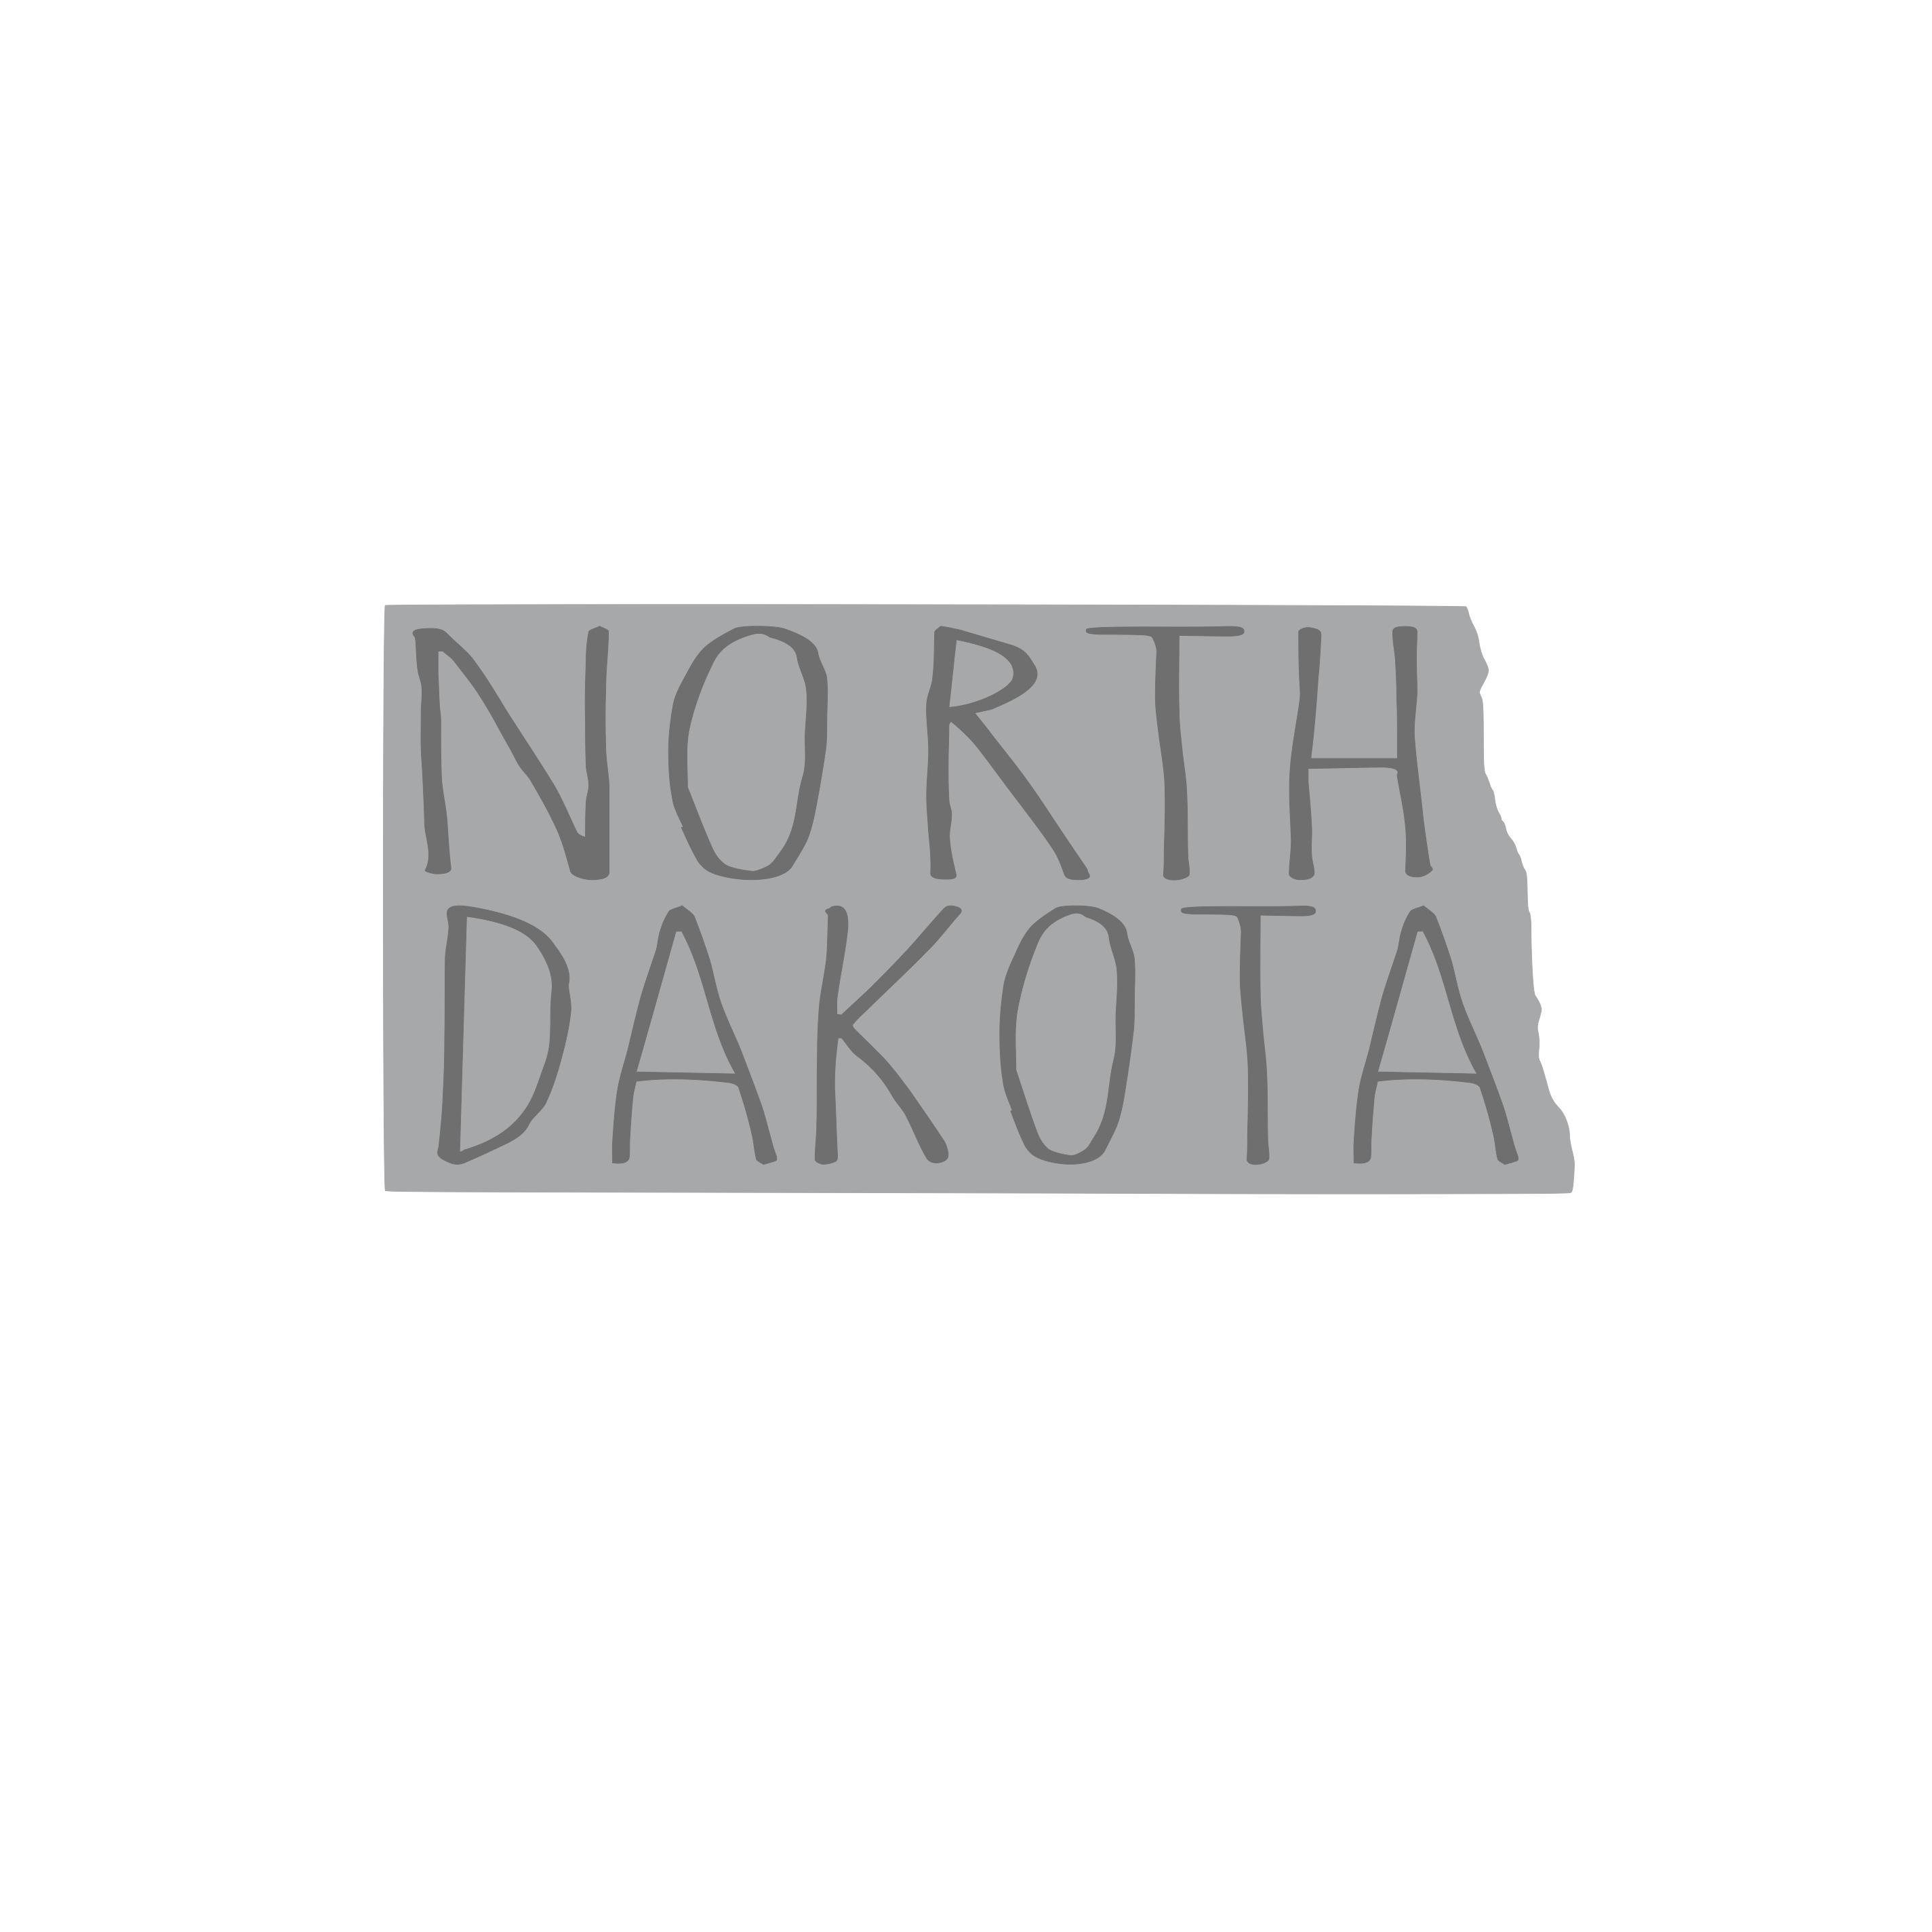 8331 North Dakota State w/ Words